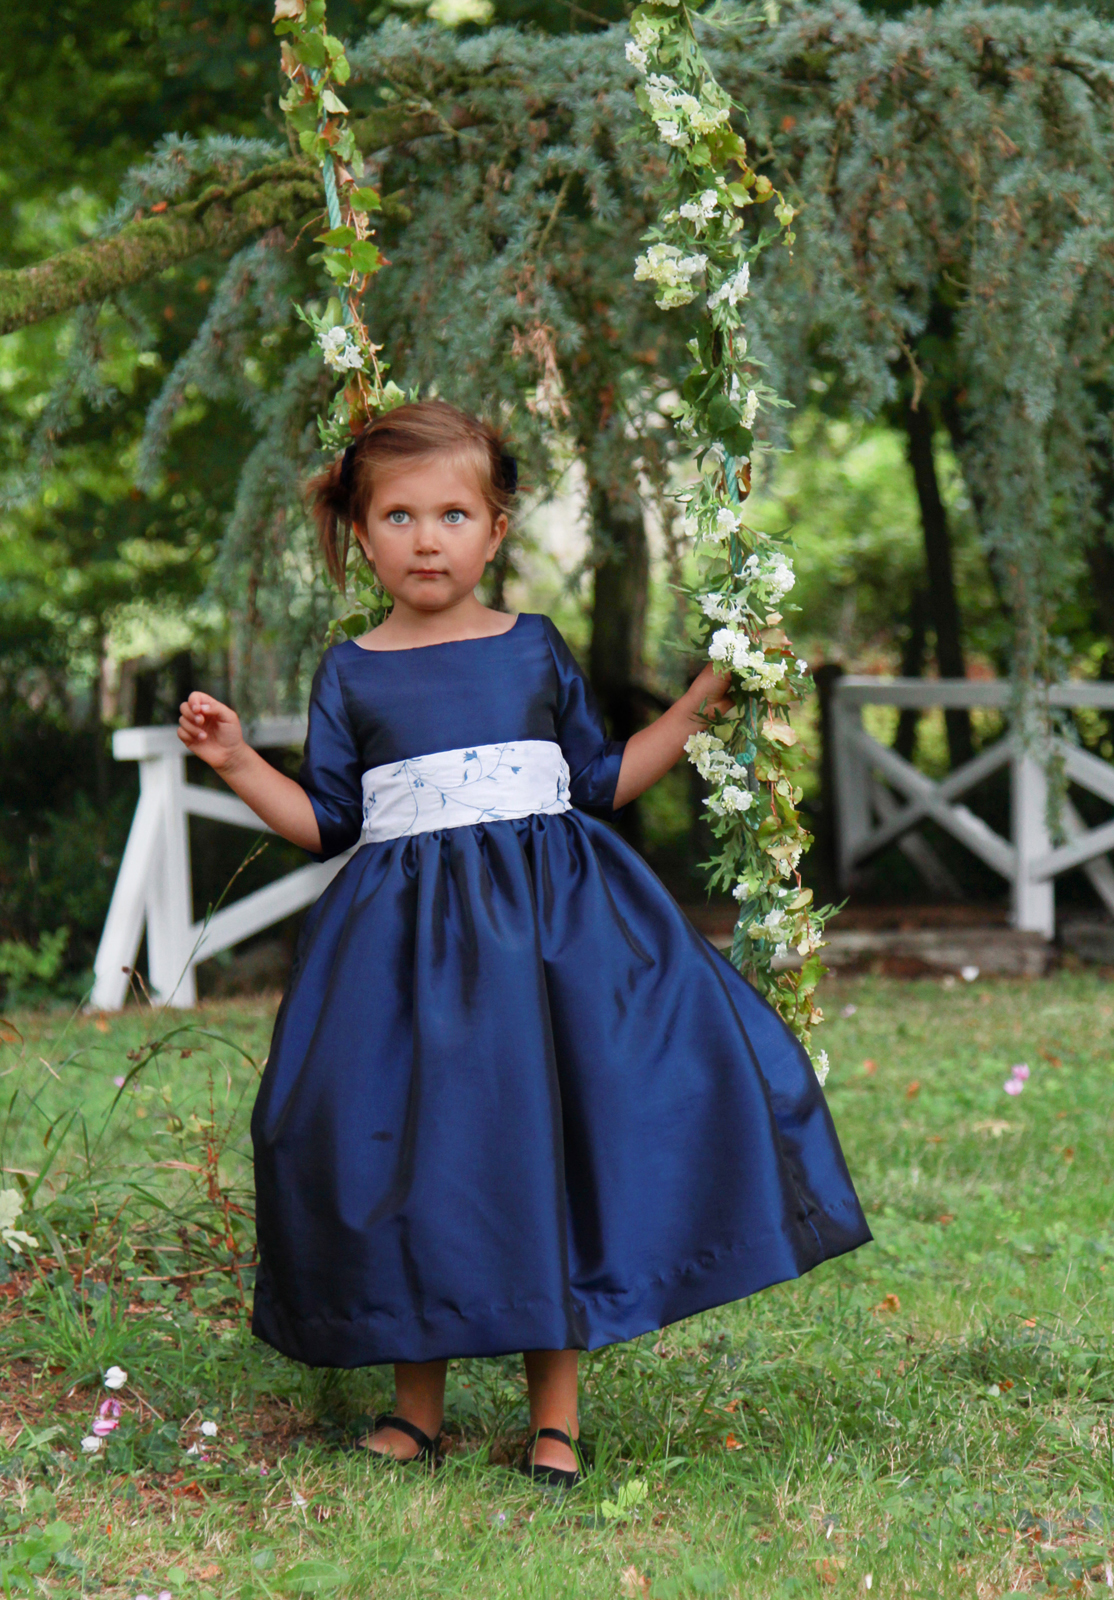 bbba14c0c0d Little Eglantine – Delightful Designs For Flower Girls   Page Boys ...